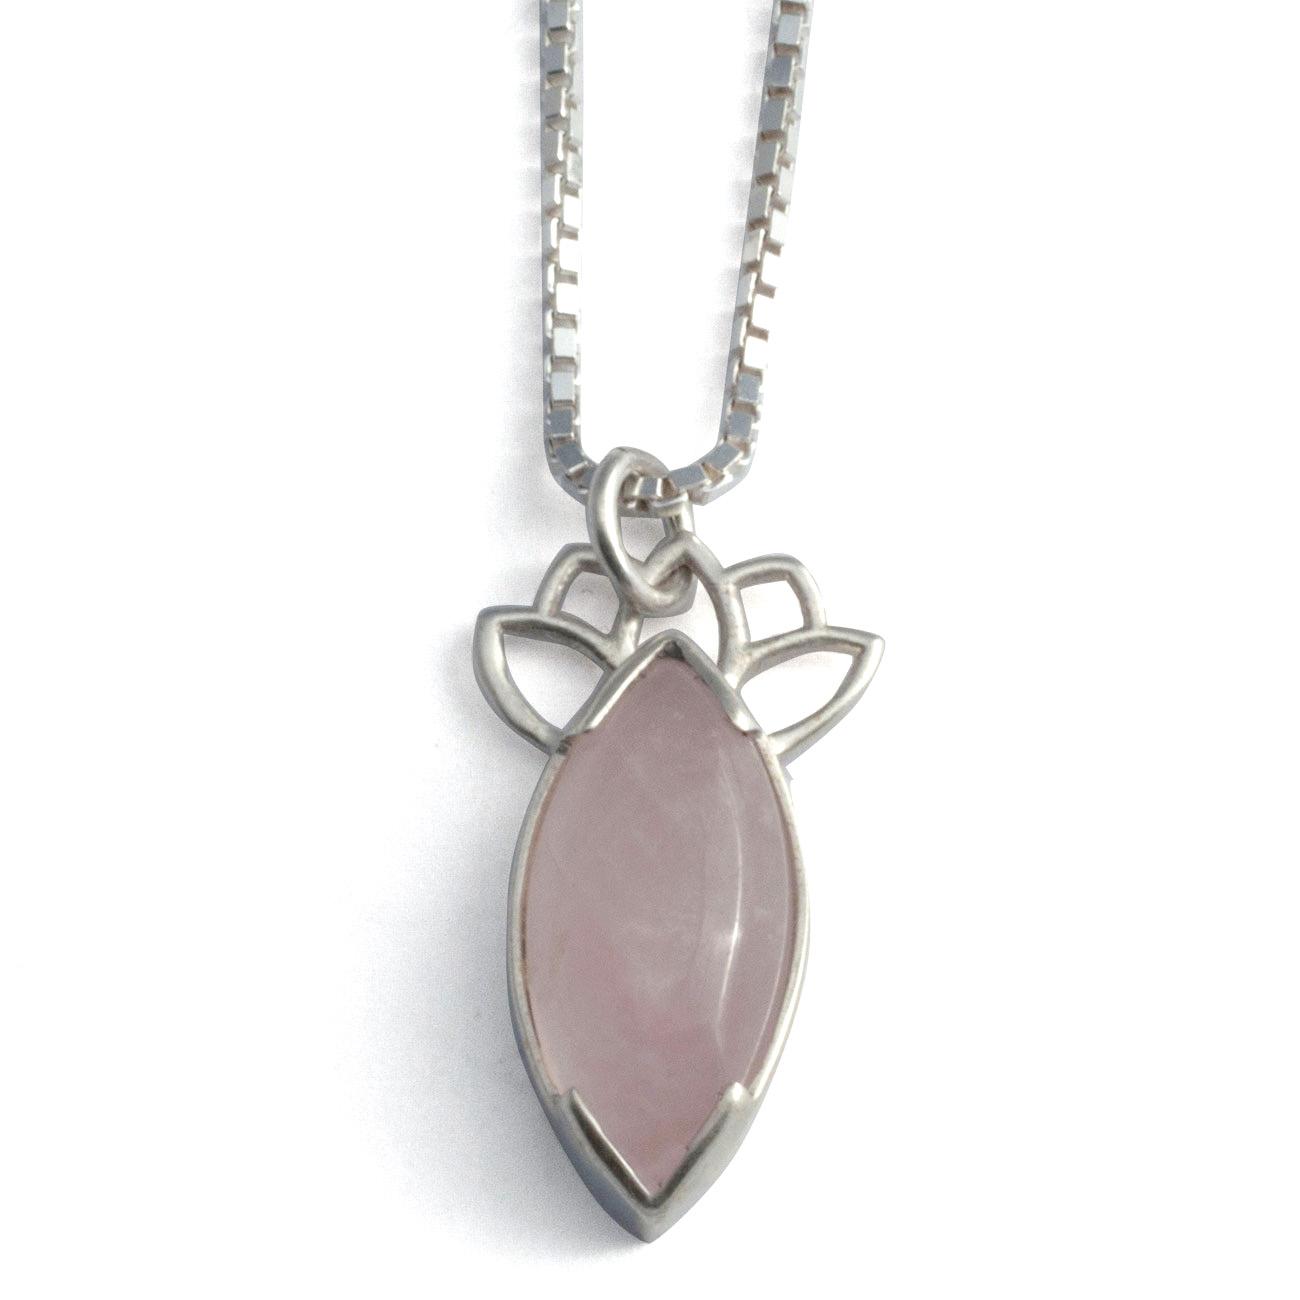 55-rose-quartz-marquise-cabochon-silver-mandala-pendant-unique.jpg